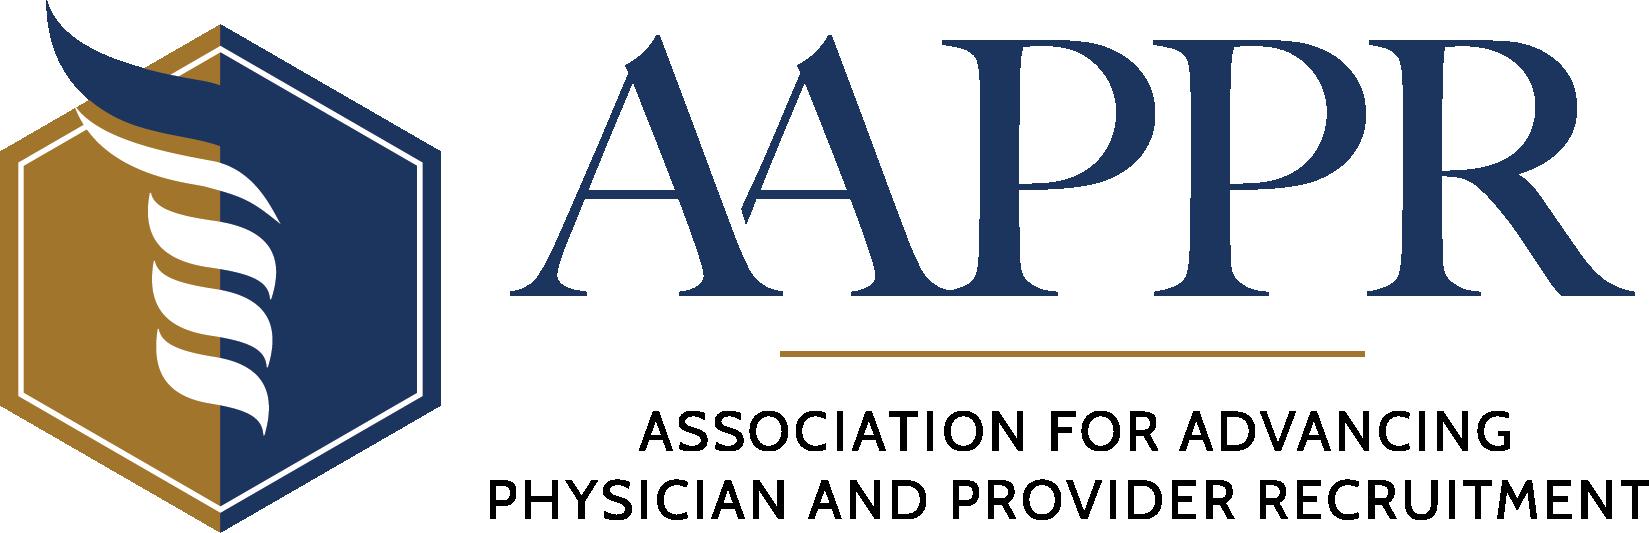 Journal of ASPR - Summer 2012 - Building a Business Case for